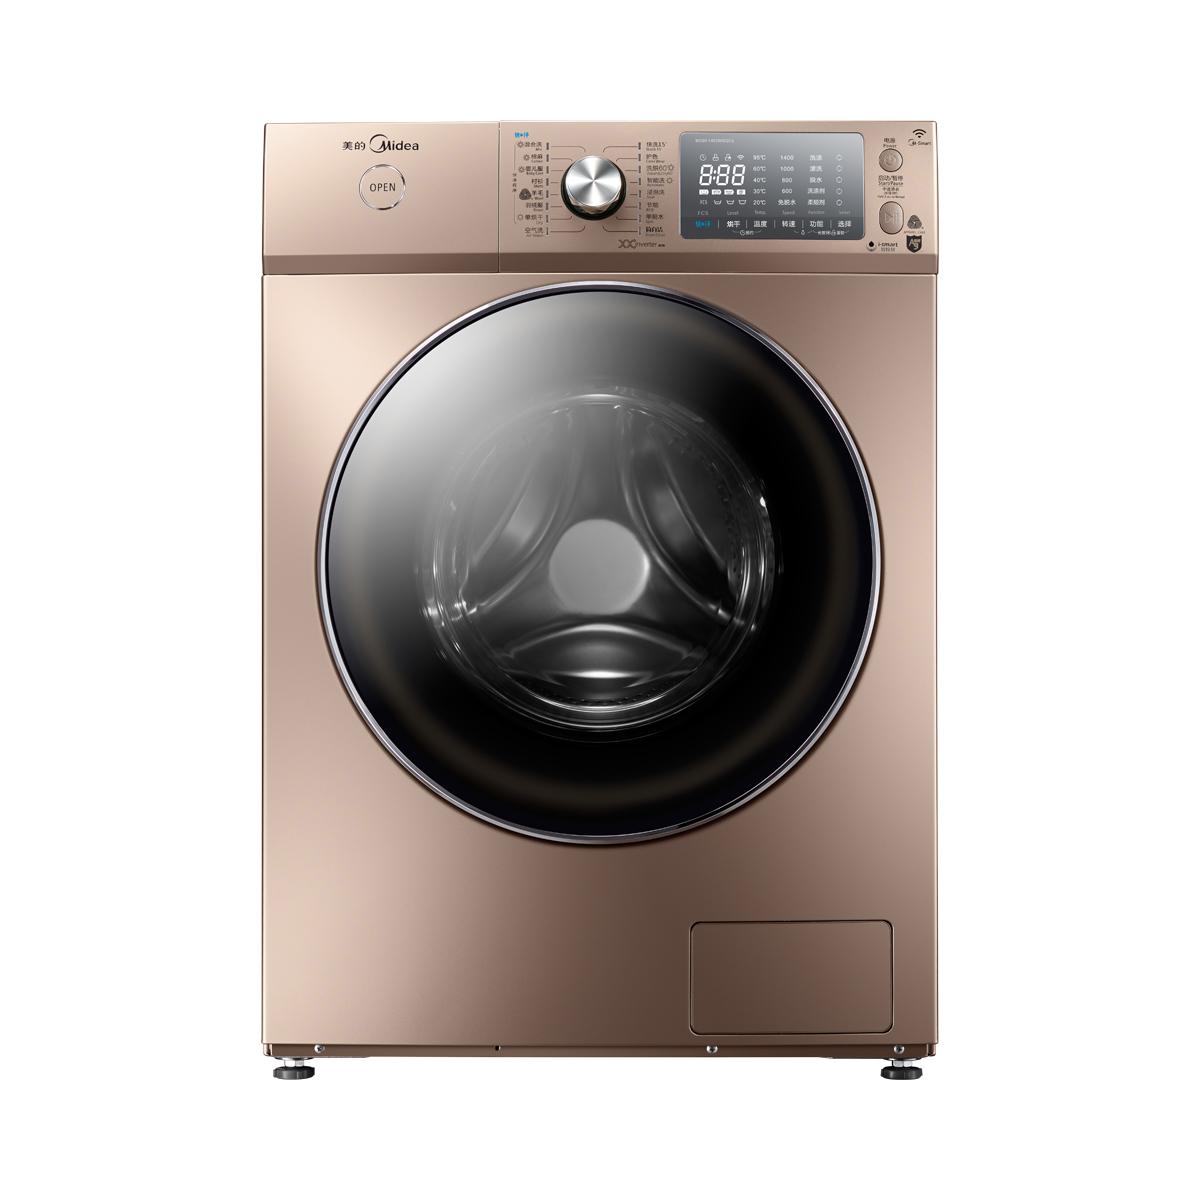 Midea/美的 MD80-1405WIDQCG洗衣机 说明书.pdf